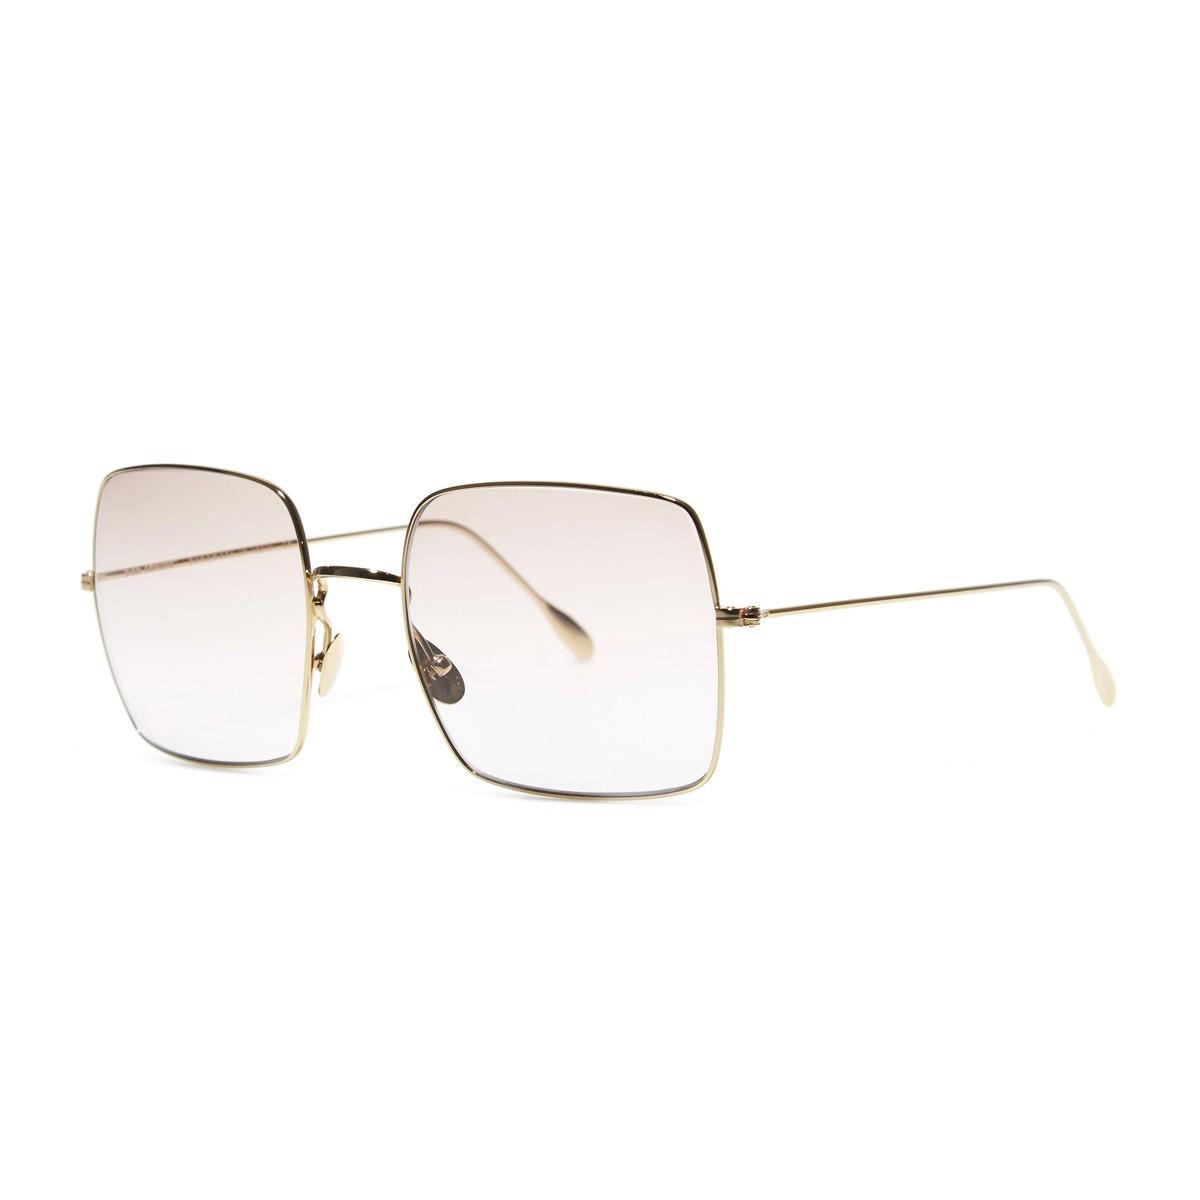 Bob Sdrunk Linda | Women's sunglasses